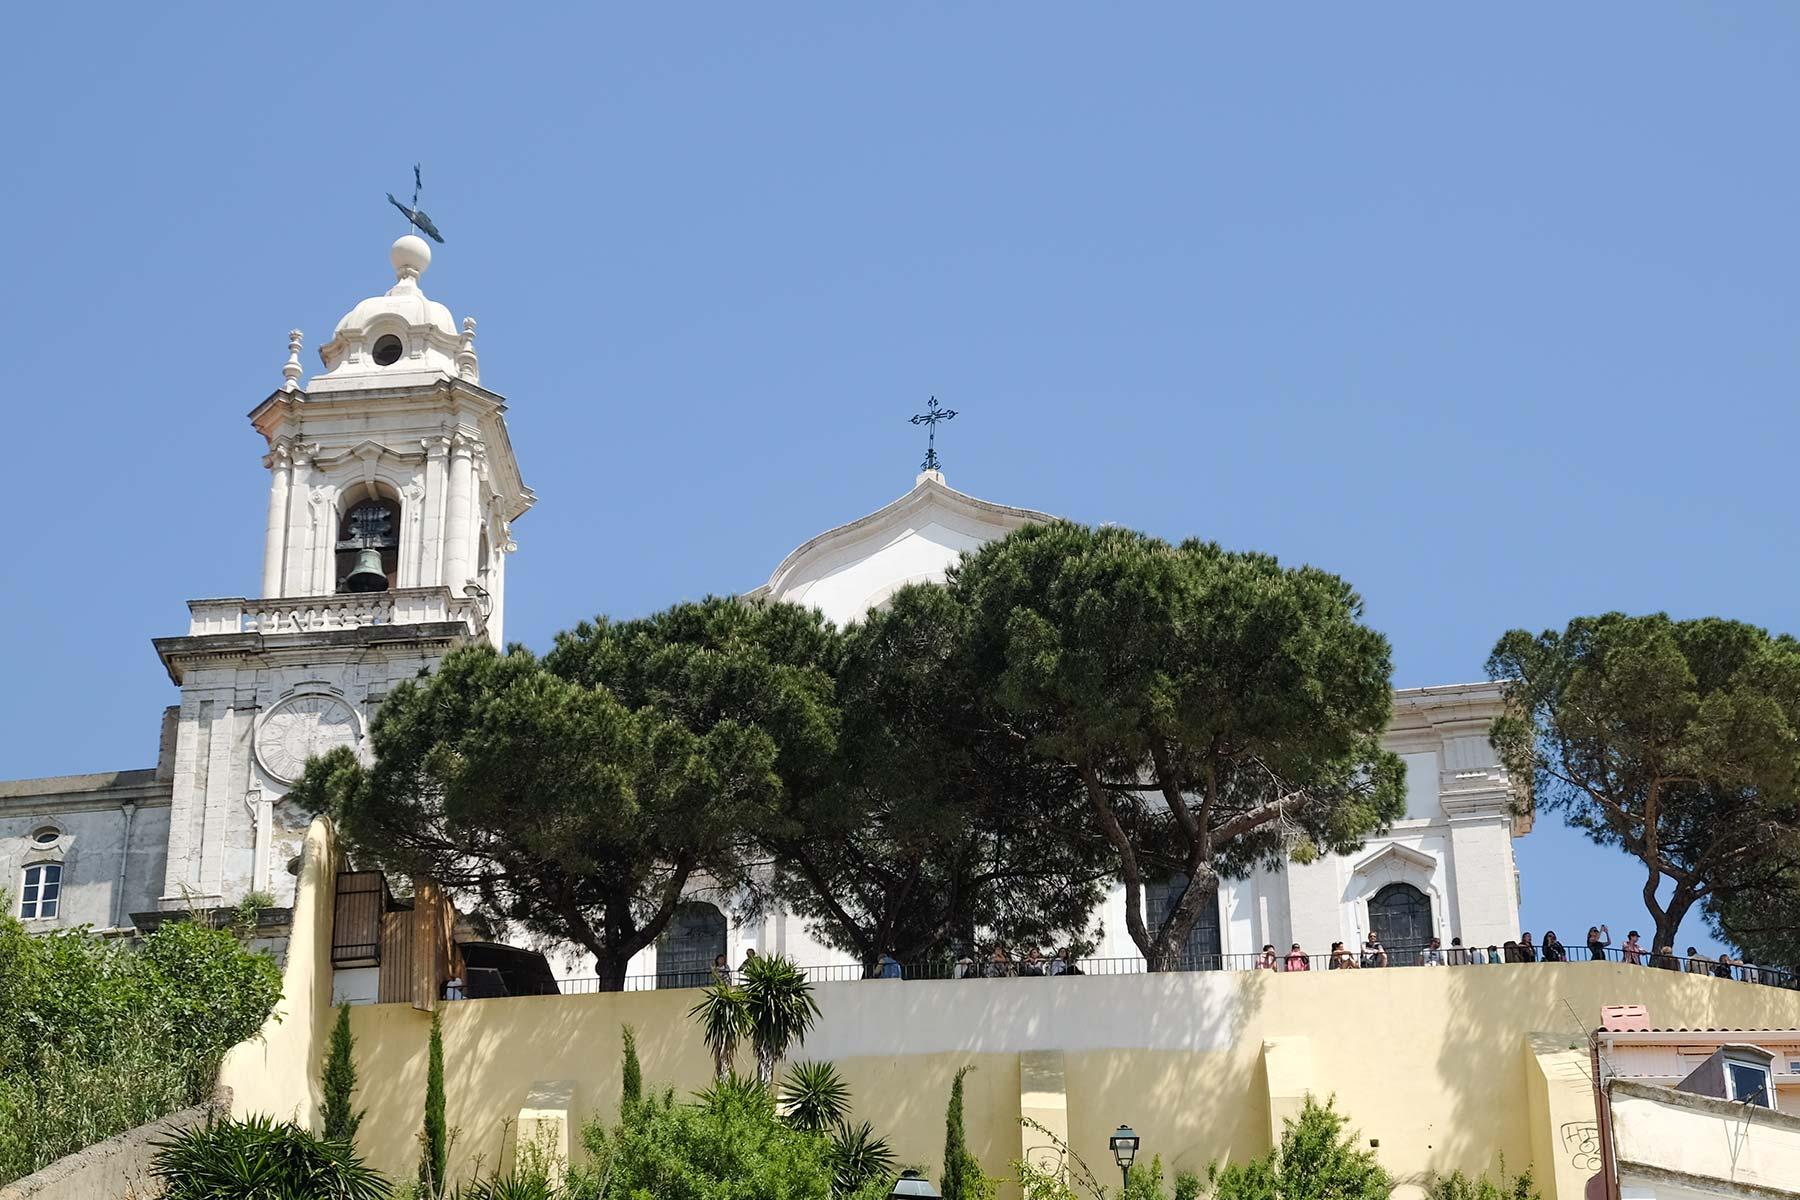 Igreja e Convento da Graça in Lissabon, Portugal